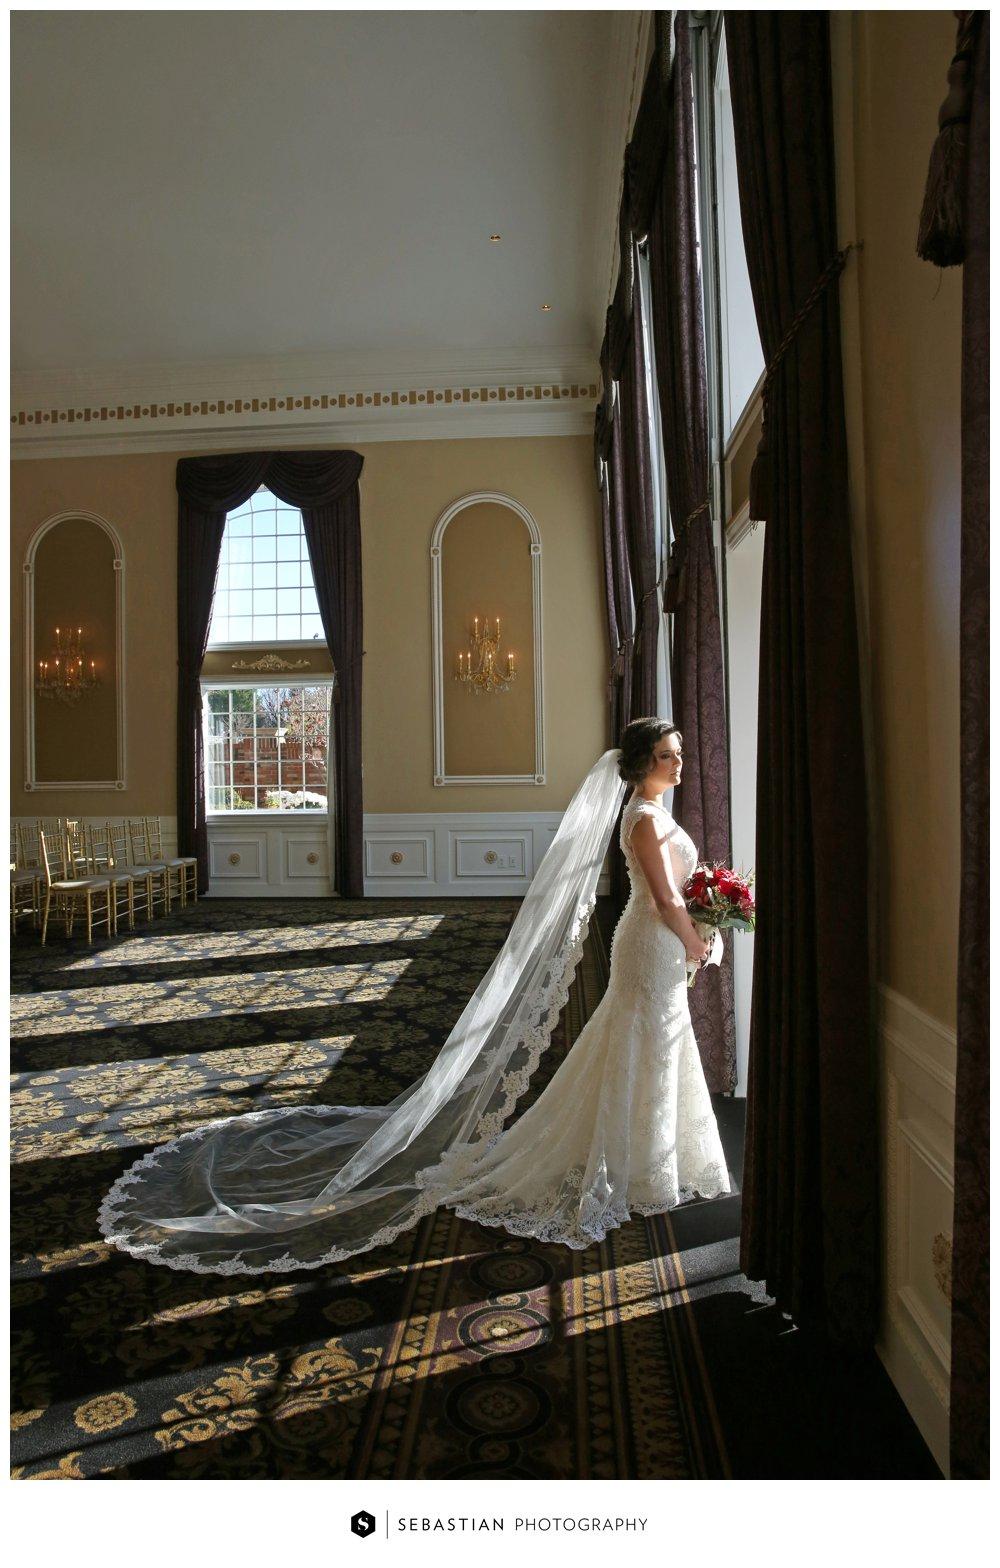 Sebastian Photography_NJ Wedding_NJWedding Photographer_Fall Wedding_The Estate at Florentine Gardens_7014.jpg